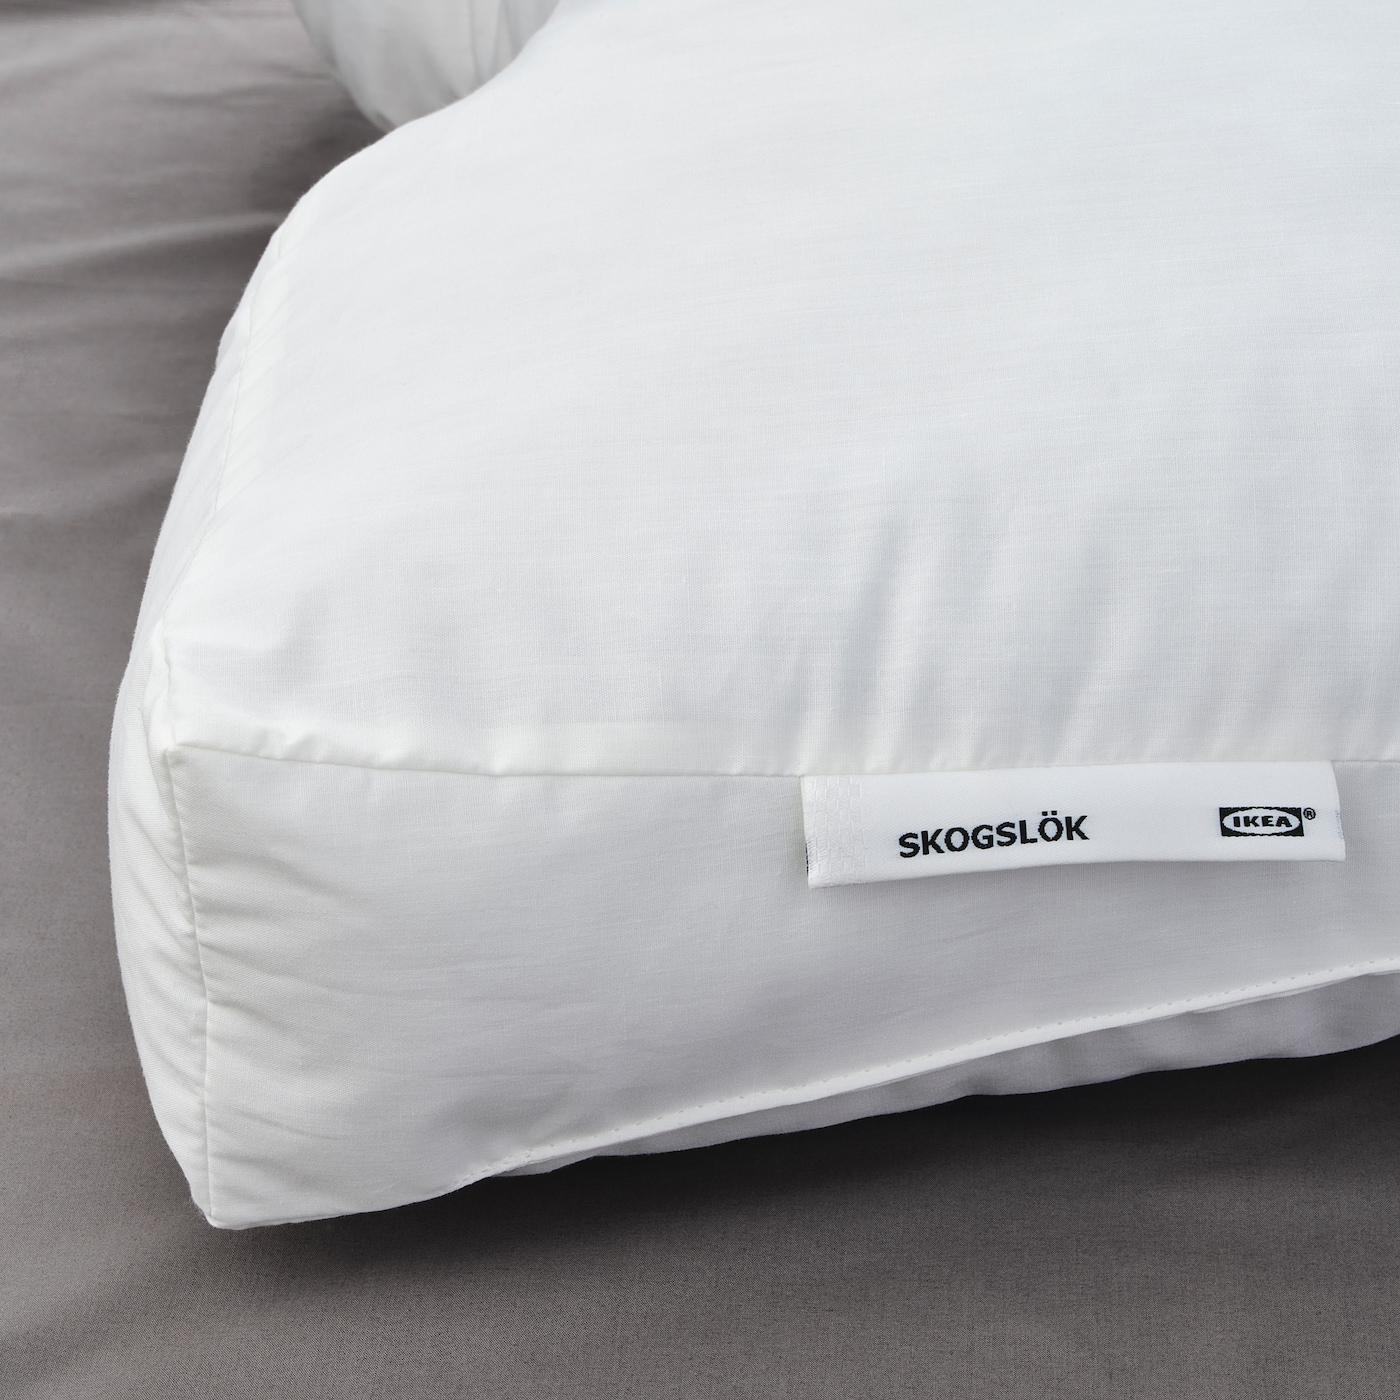 2 X IKEA RAKNÖREL 33x50cm Synthetic Ergonomic Pillow Raknorel pup10